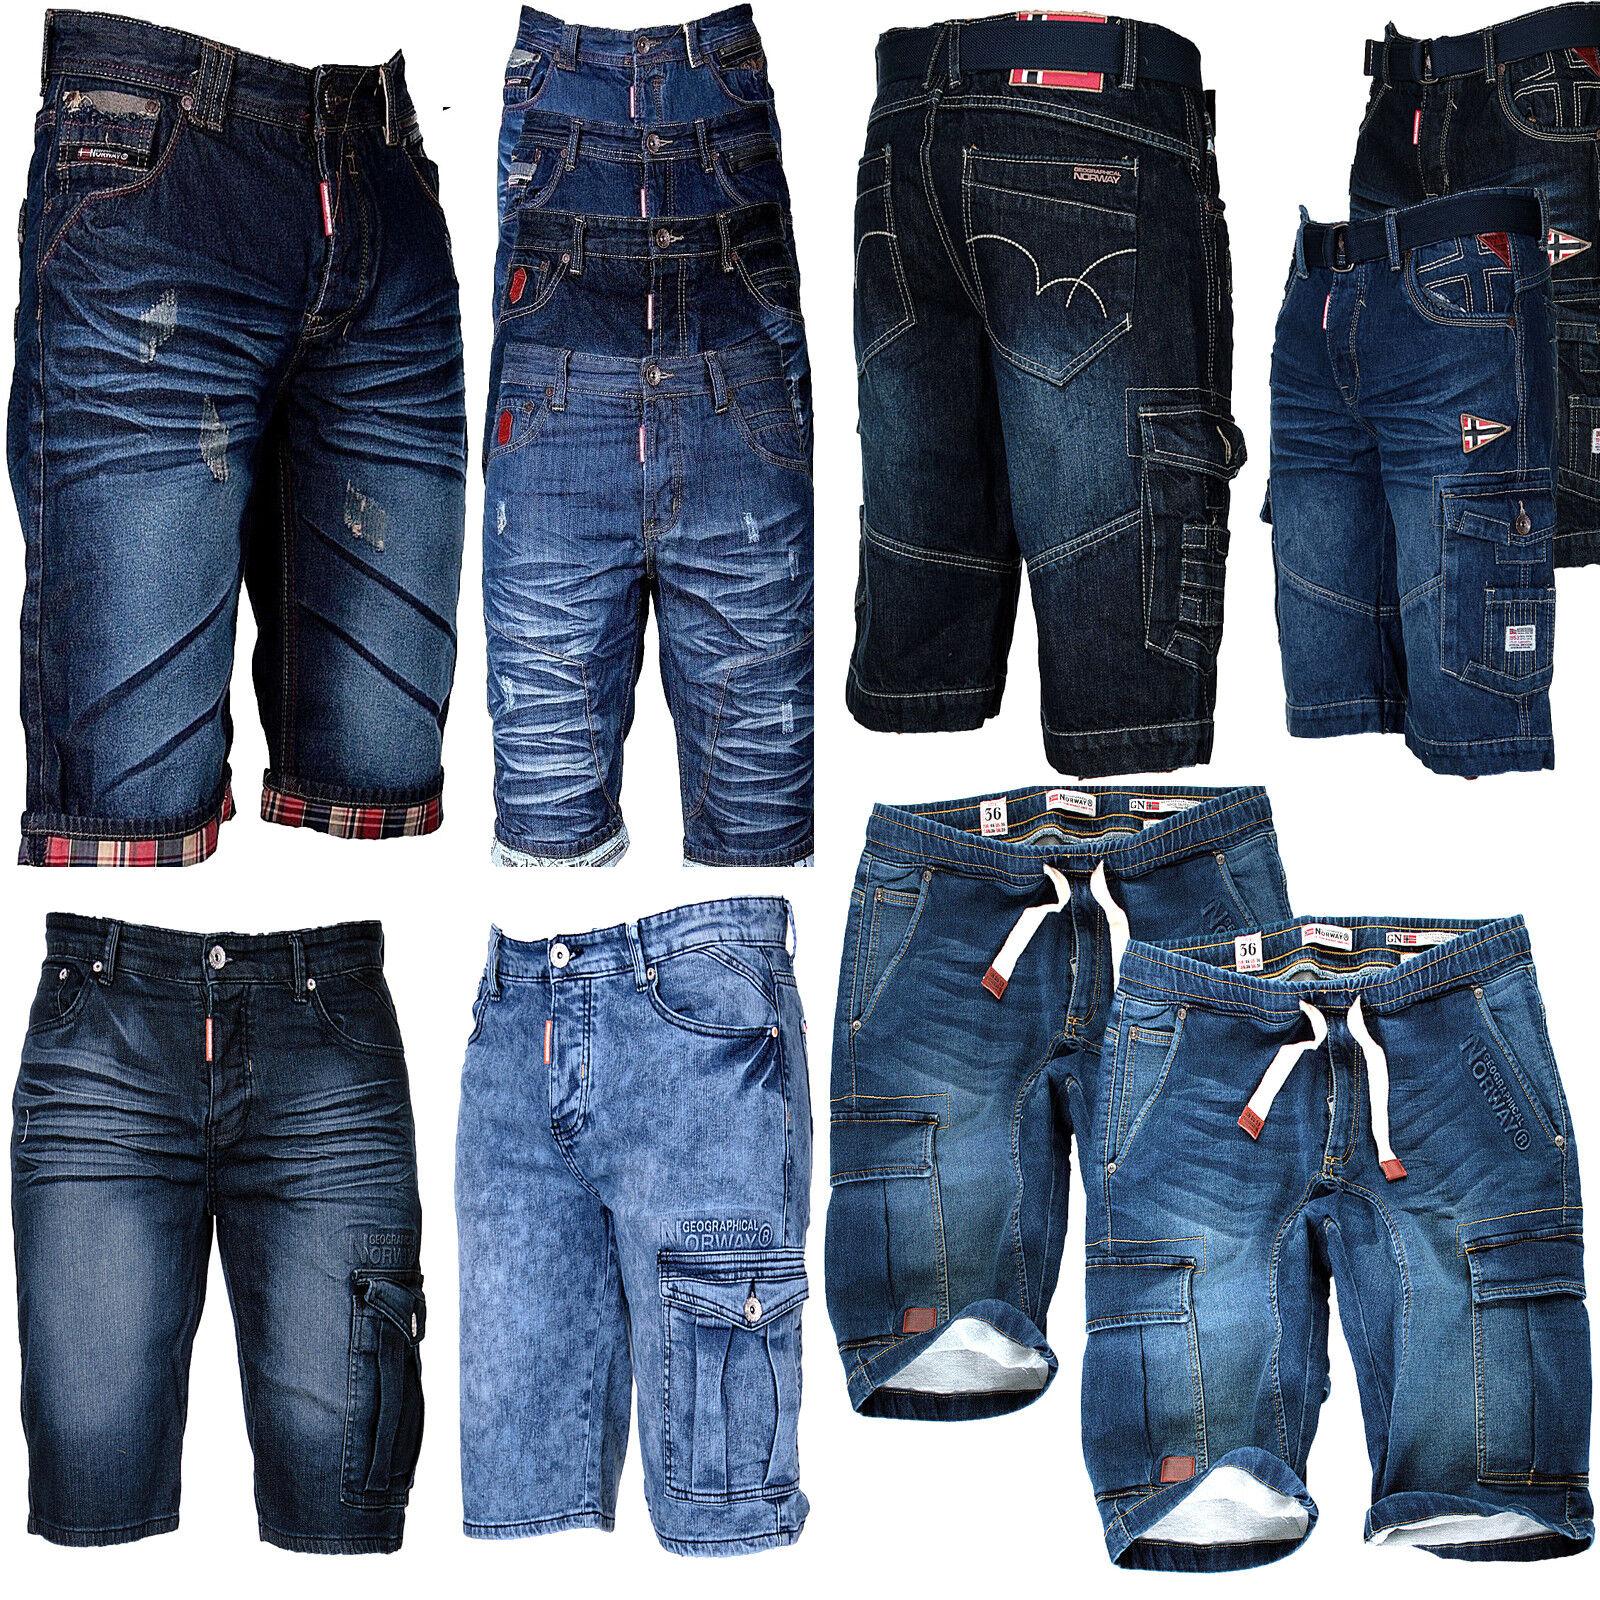 Geographical Norway Herren Bermuda Shorts Jeans shorts Kurze Hose Cargo Shorts